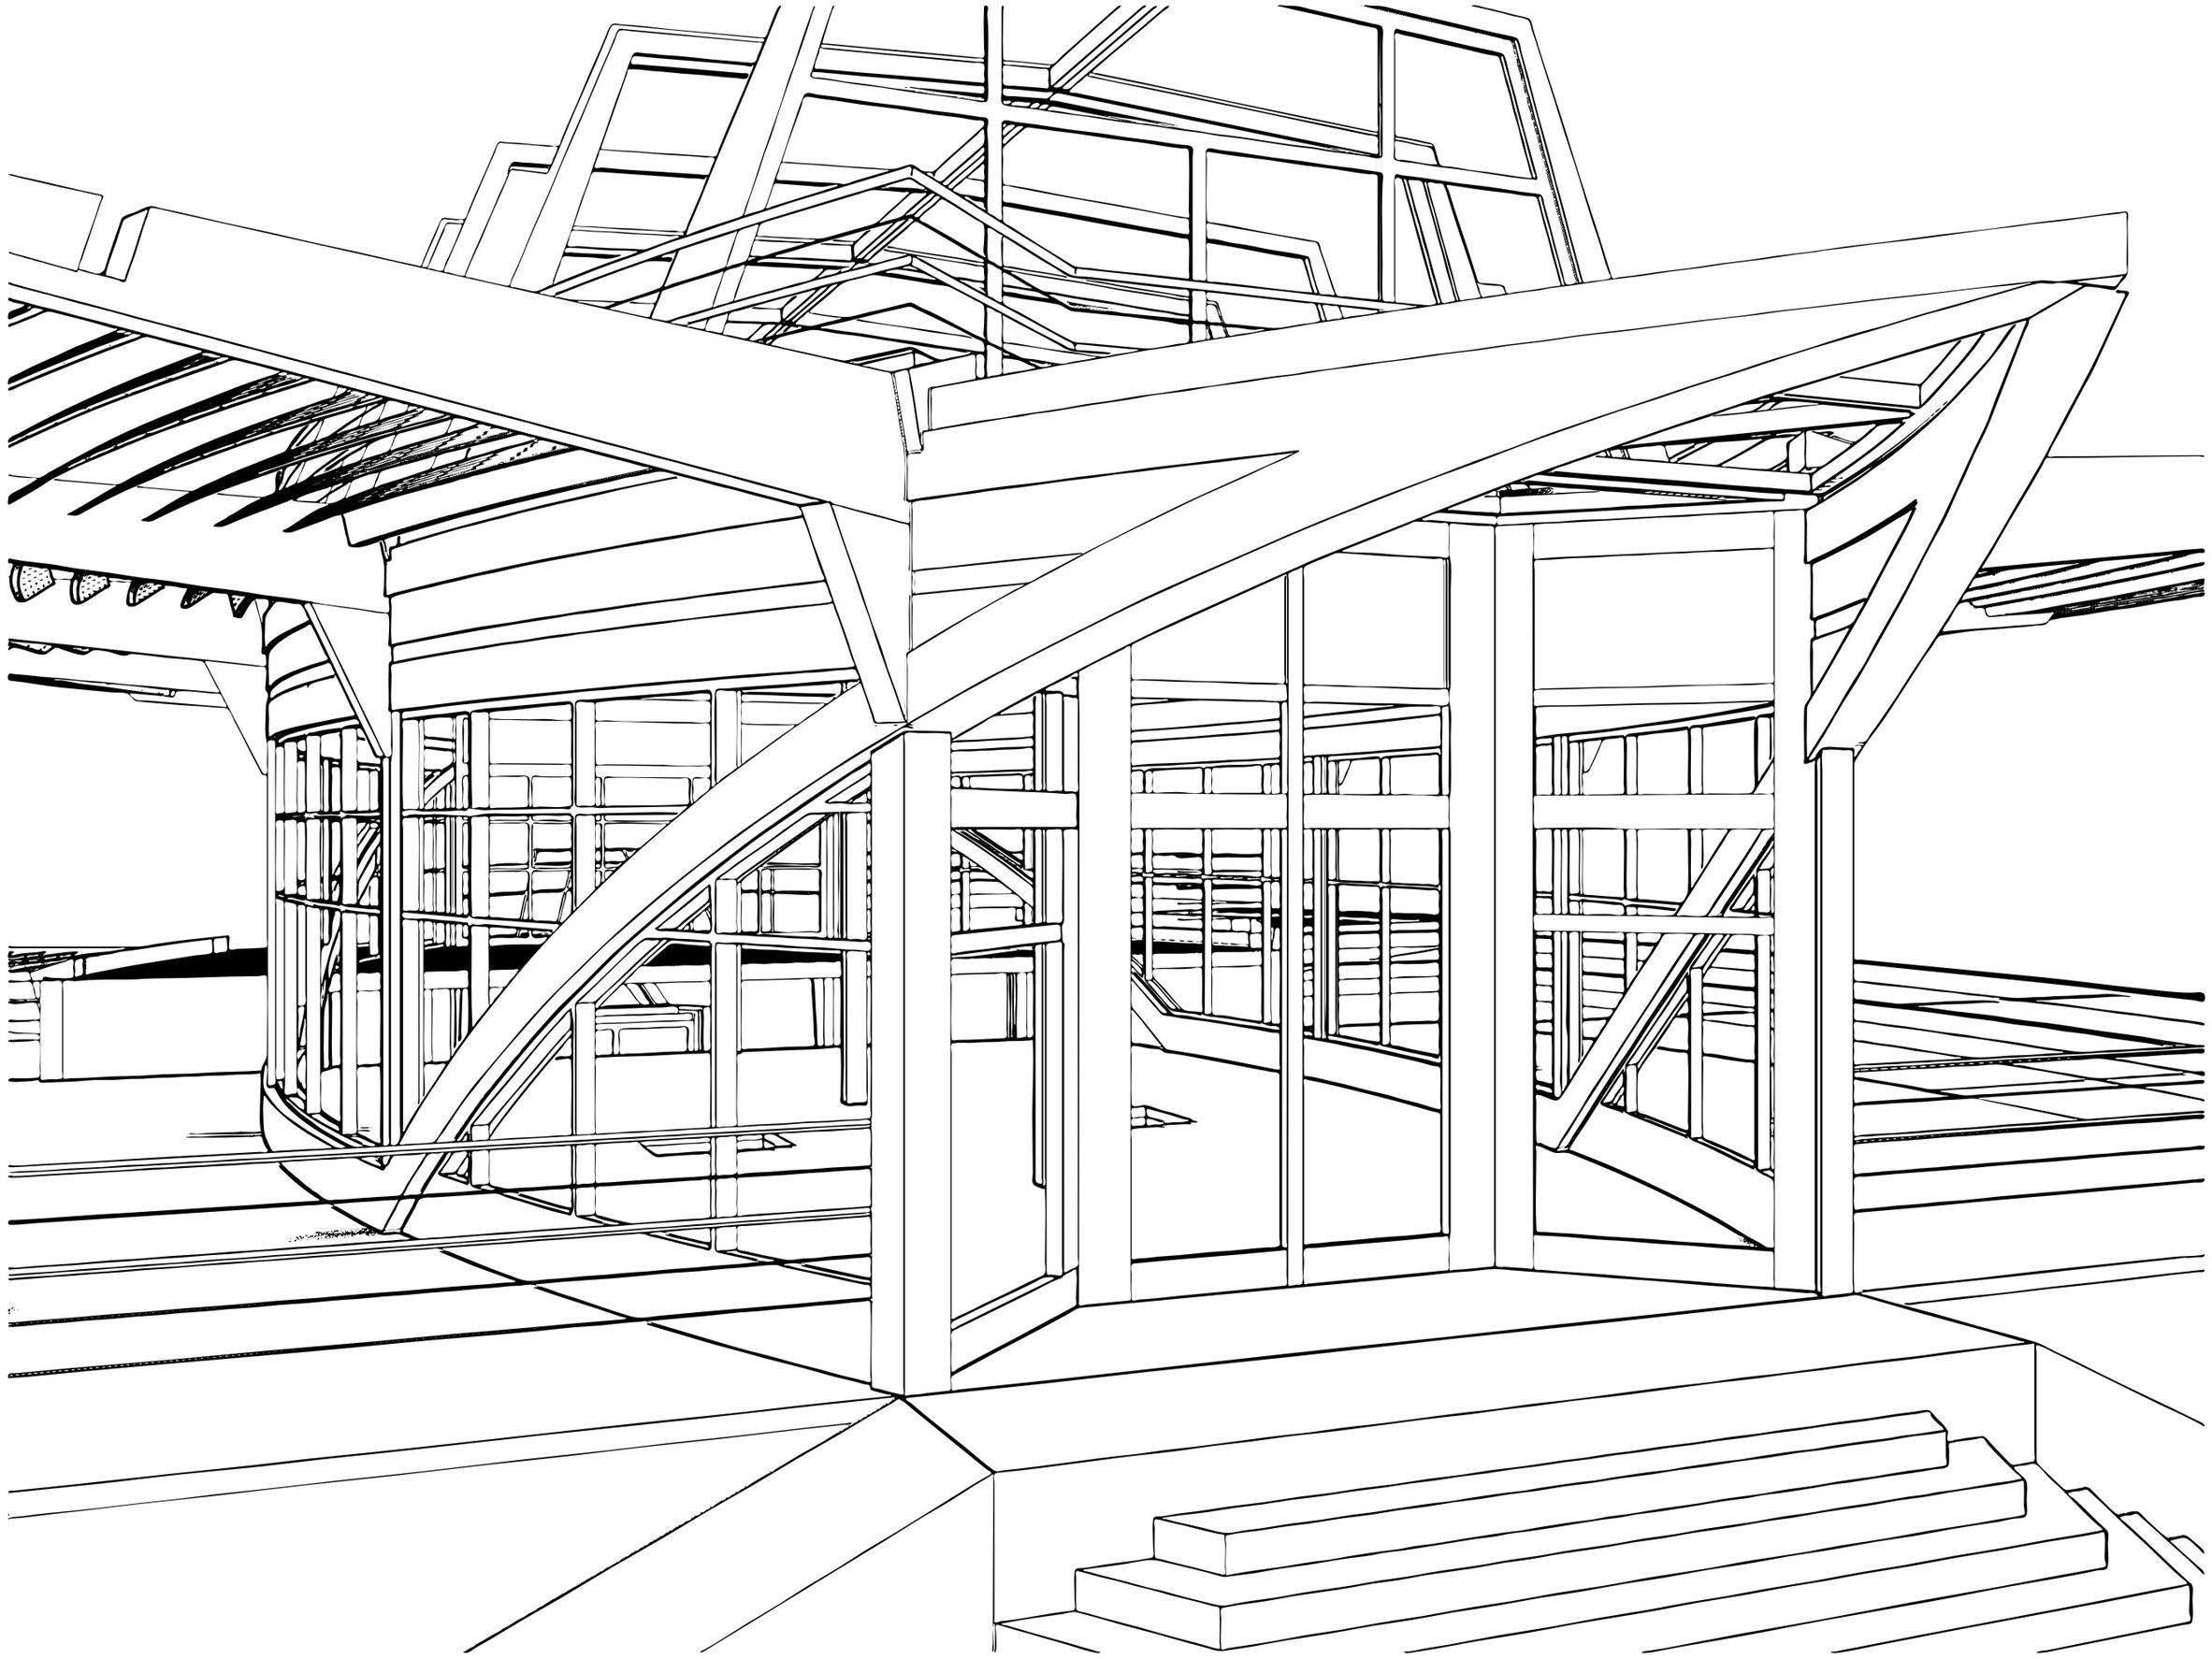 dessin d'architecte